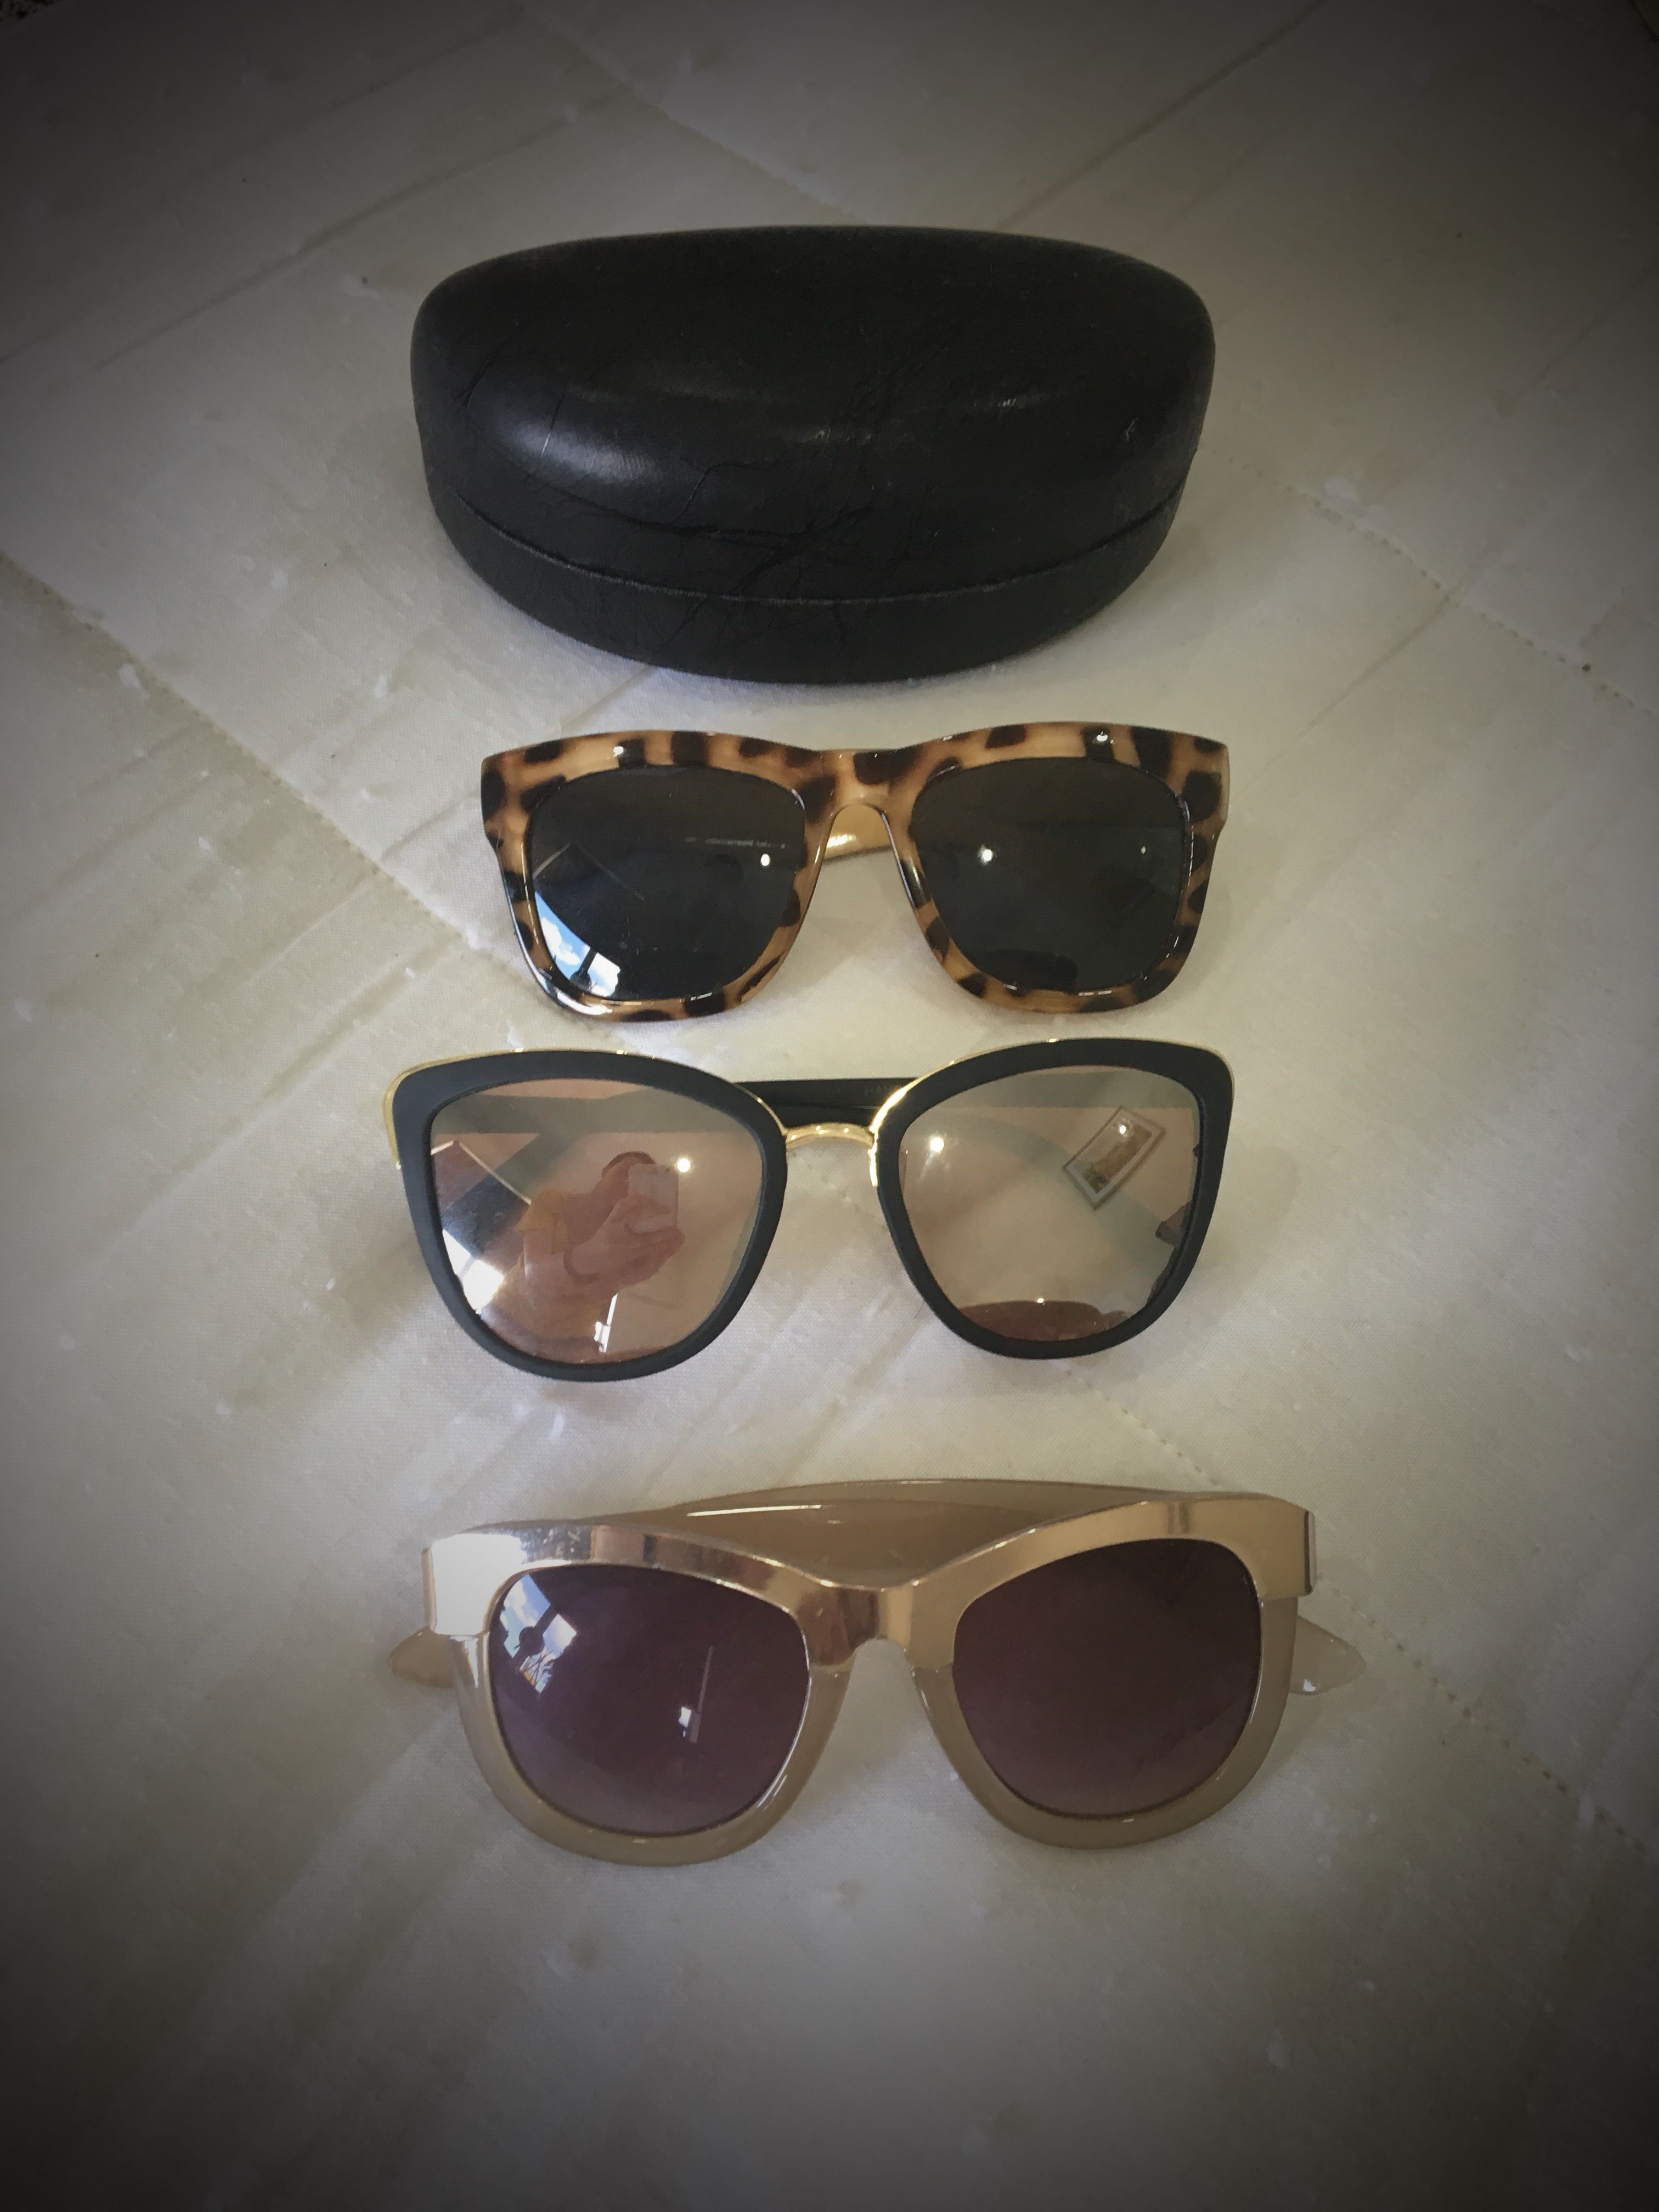 X3 sunglasses